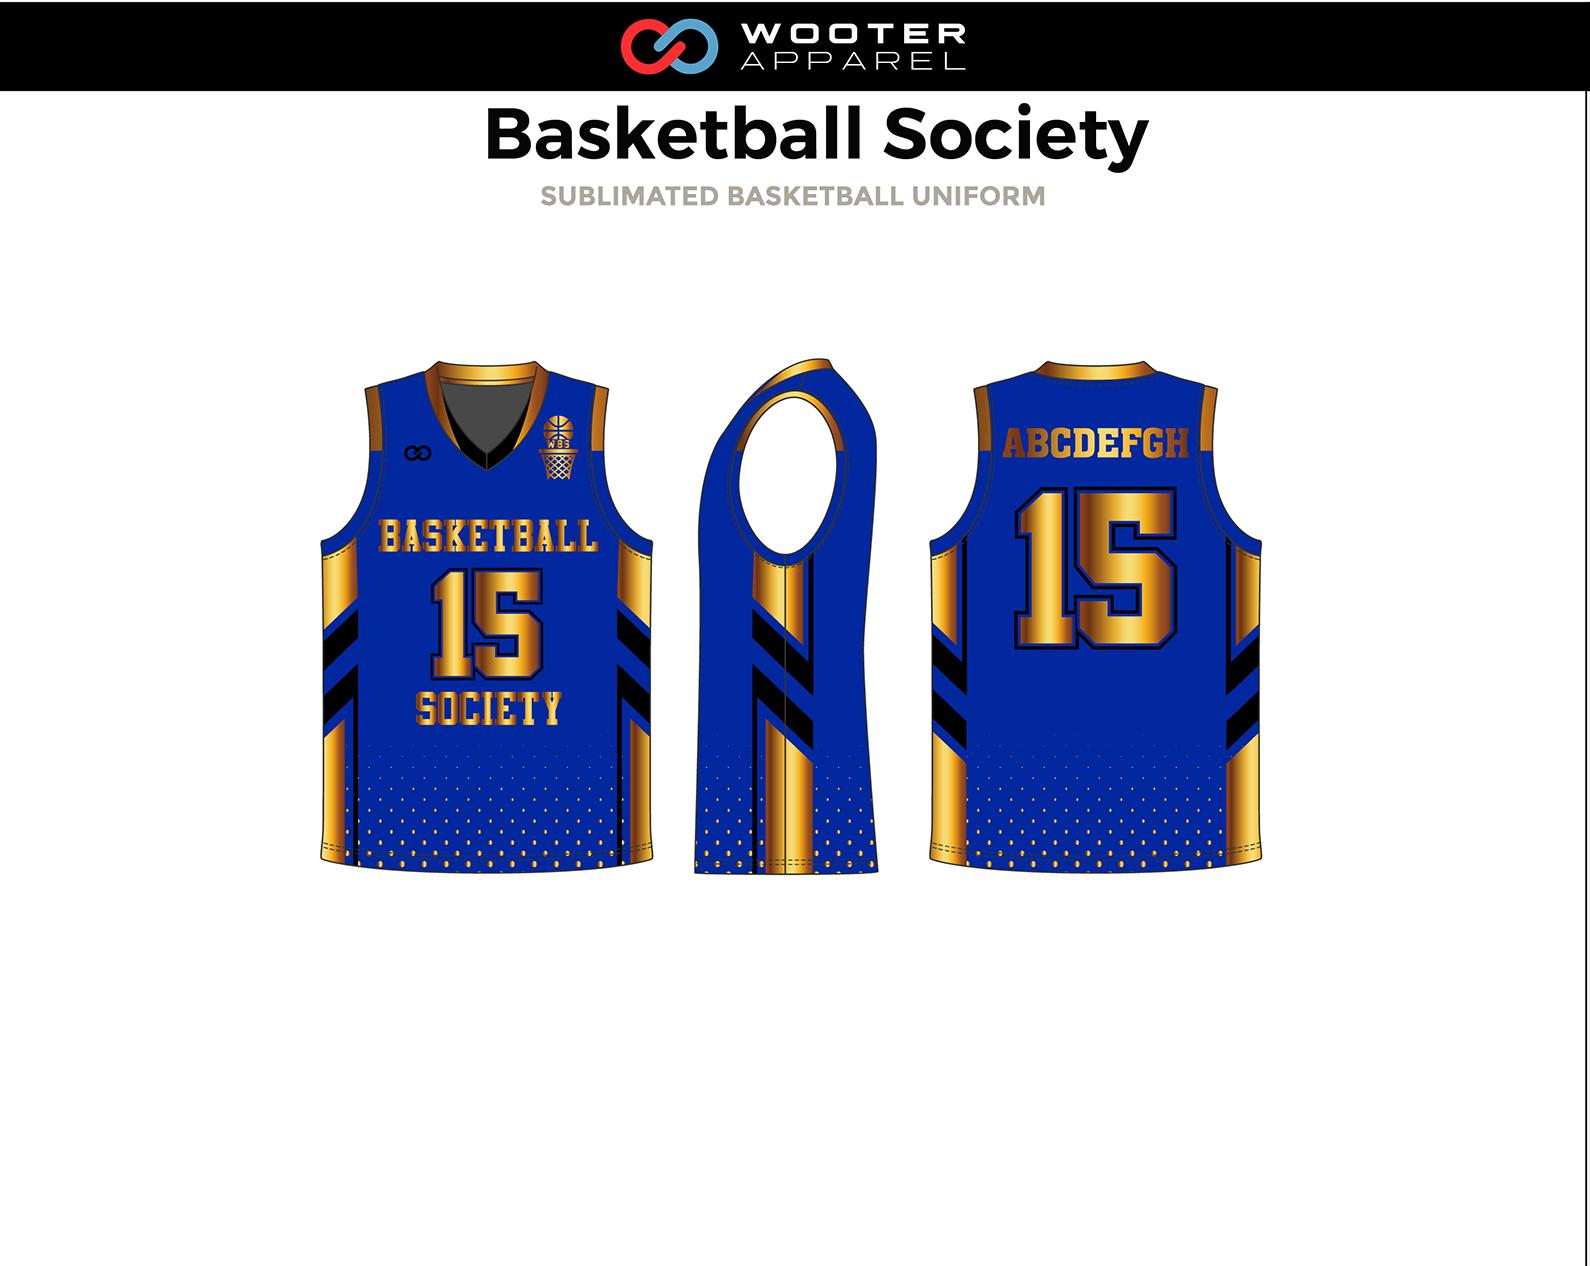 Basketball Society Home Basketball Jersey-01.png